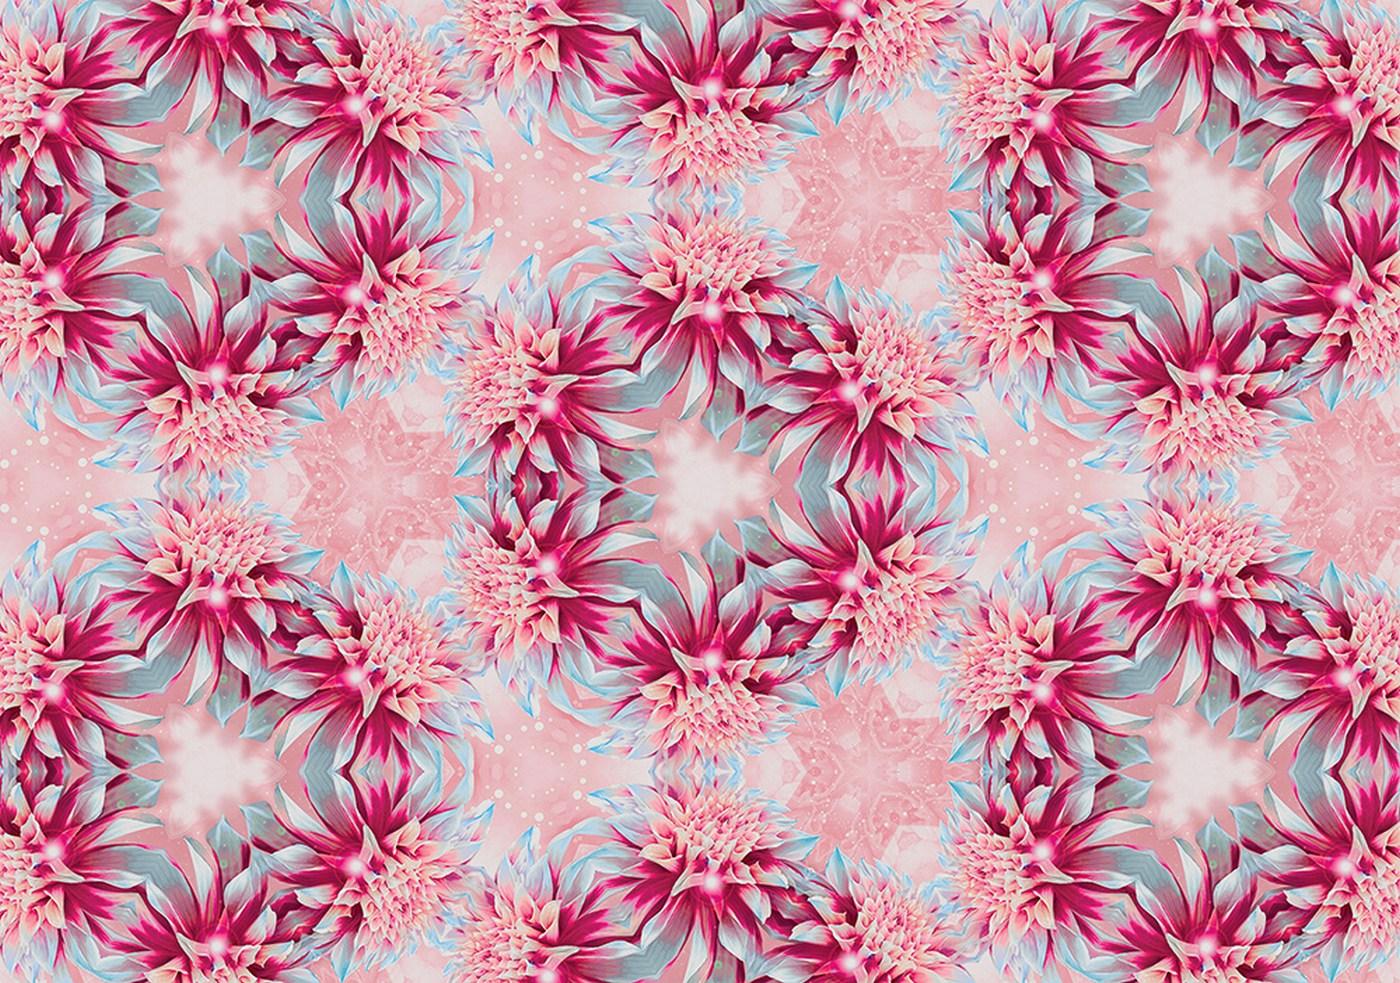 vlies fototapete 1290 illustrationen tapete muster blume illustration pink - Vliestapeten Muster